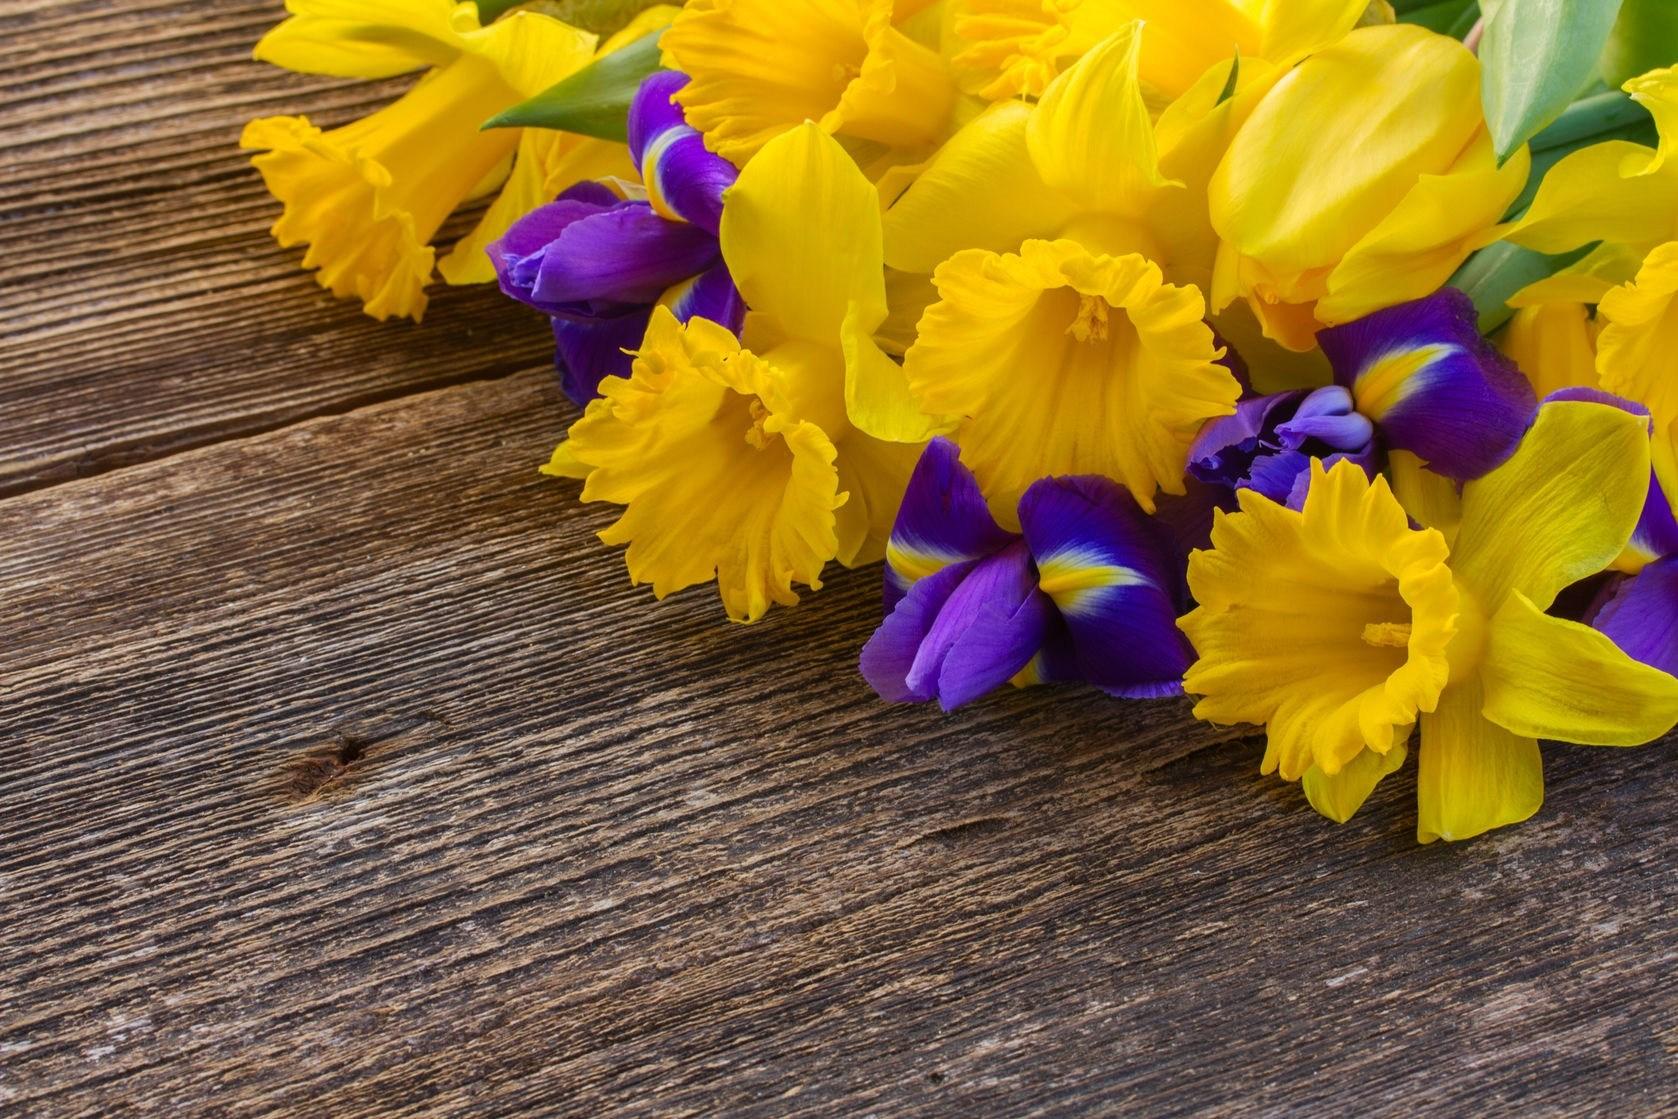 TBM 1708.15 DDOP-15: Grocery Store Flowers: Jack